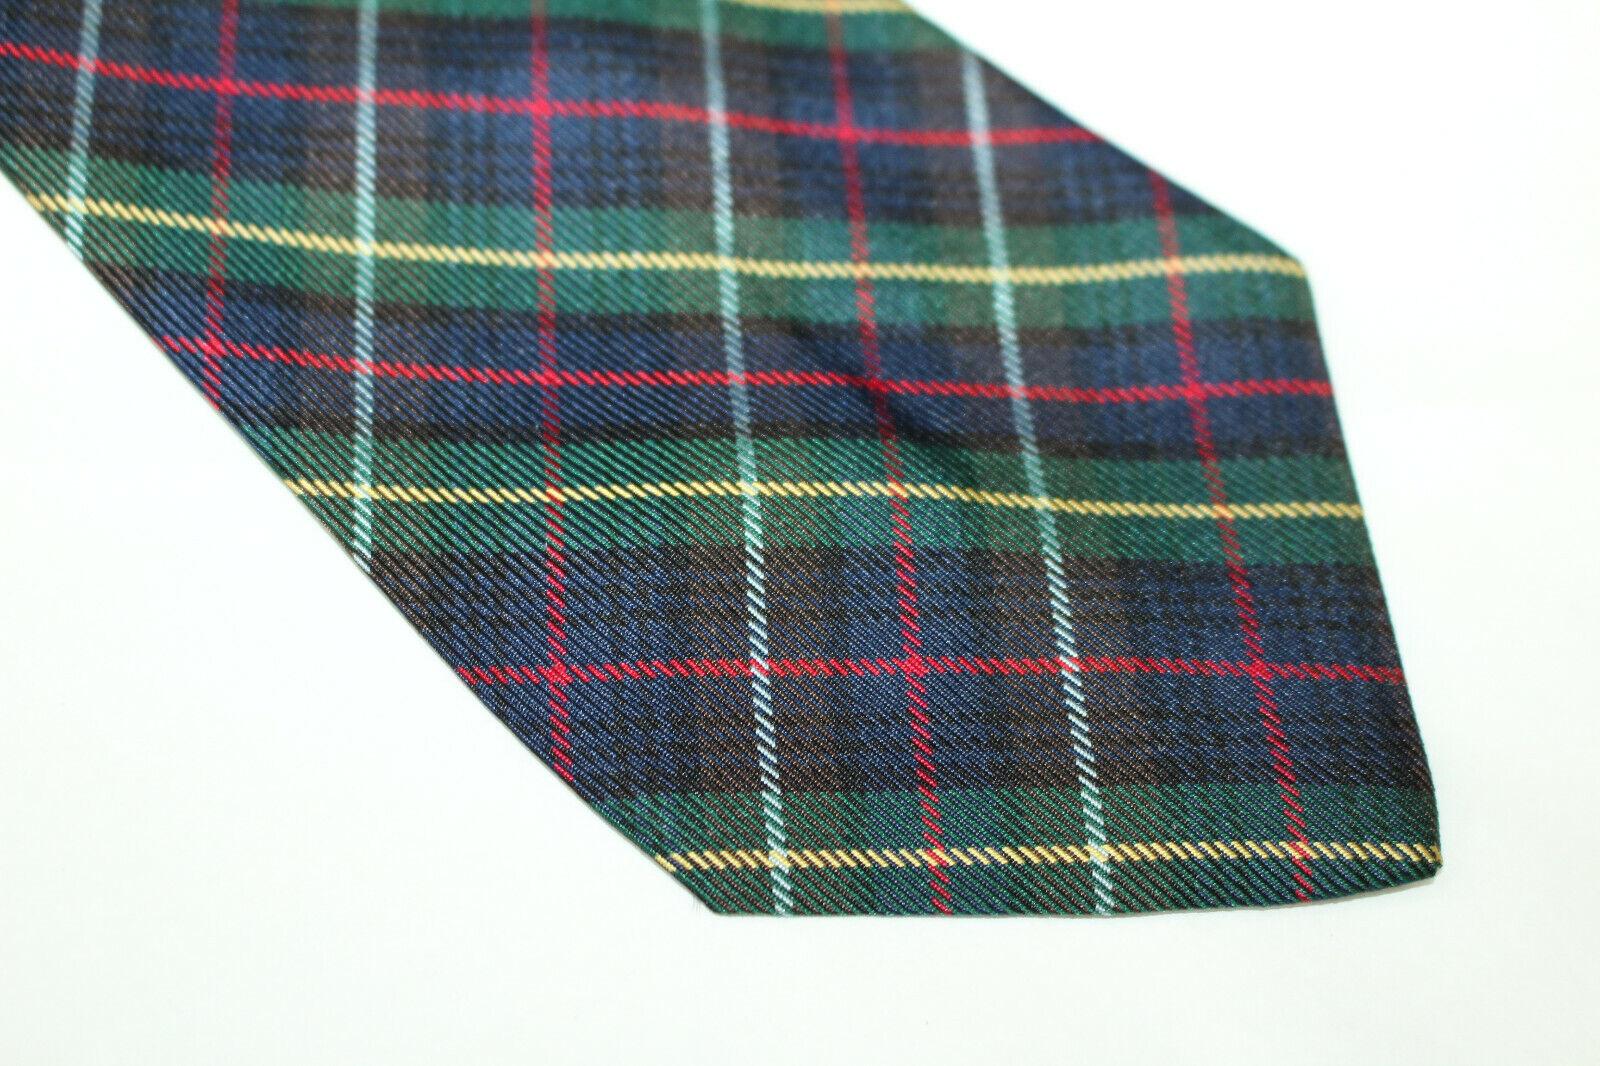 VICTOR VICTORIA Silk tie Made in Italy F10404